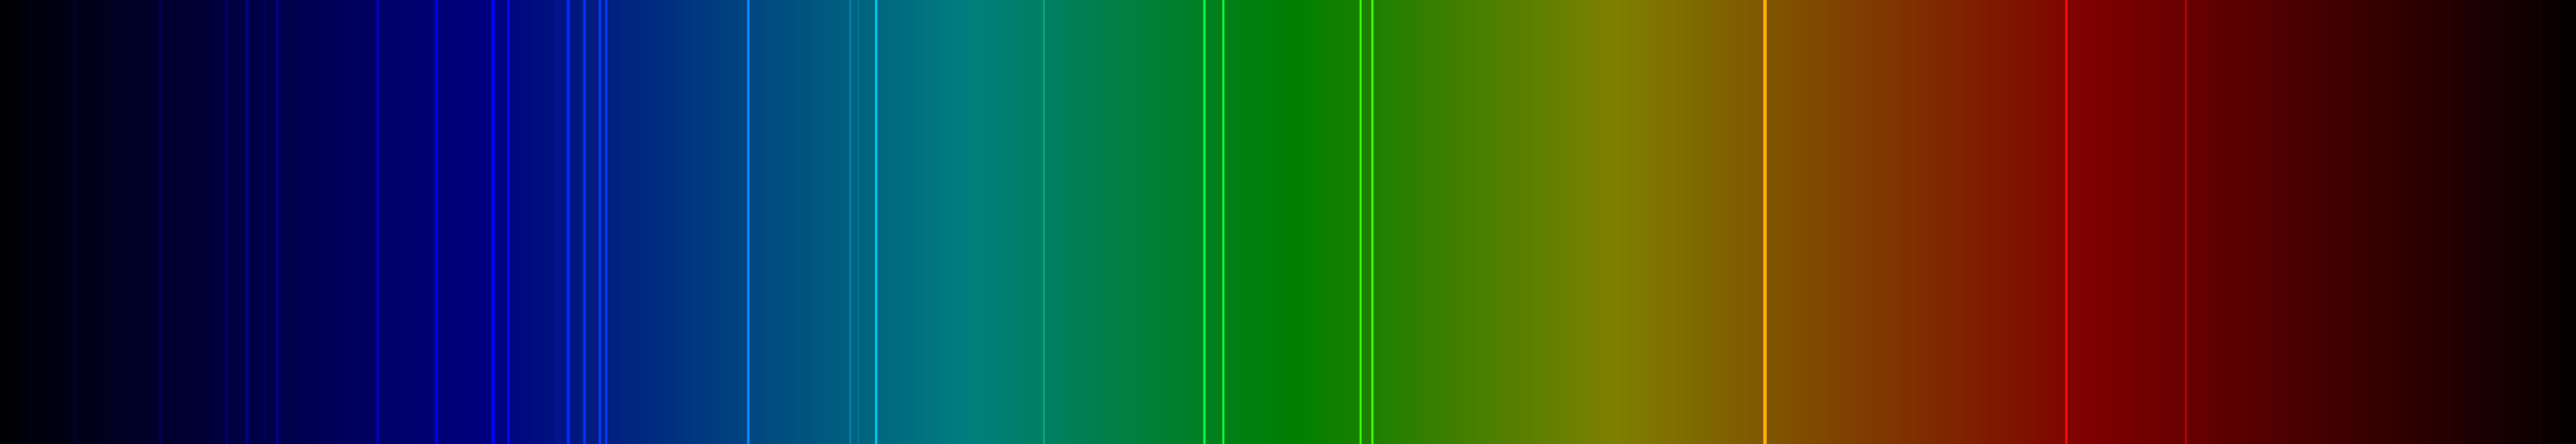 Color lines in a spectral range